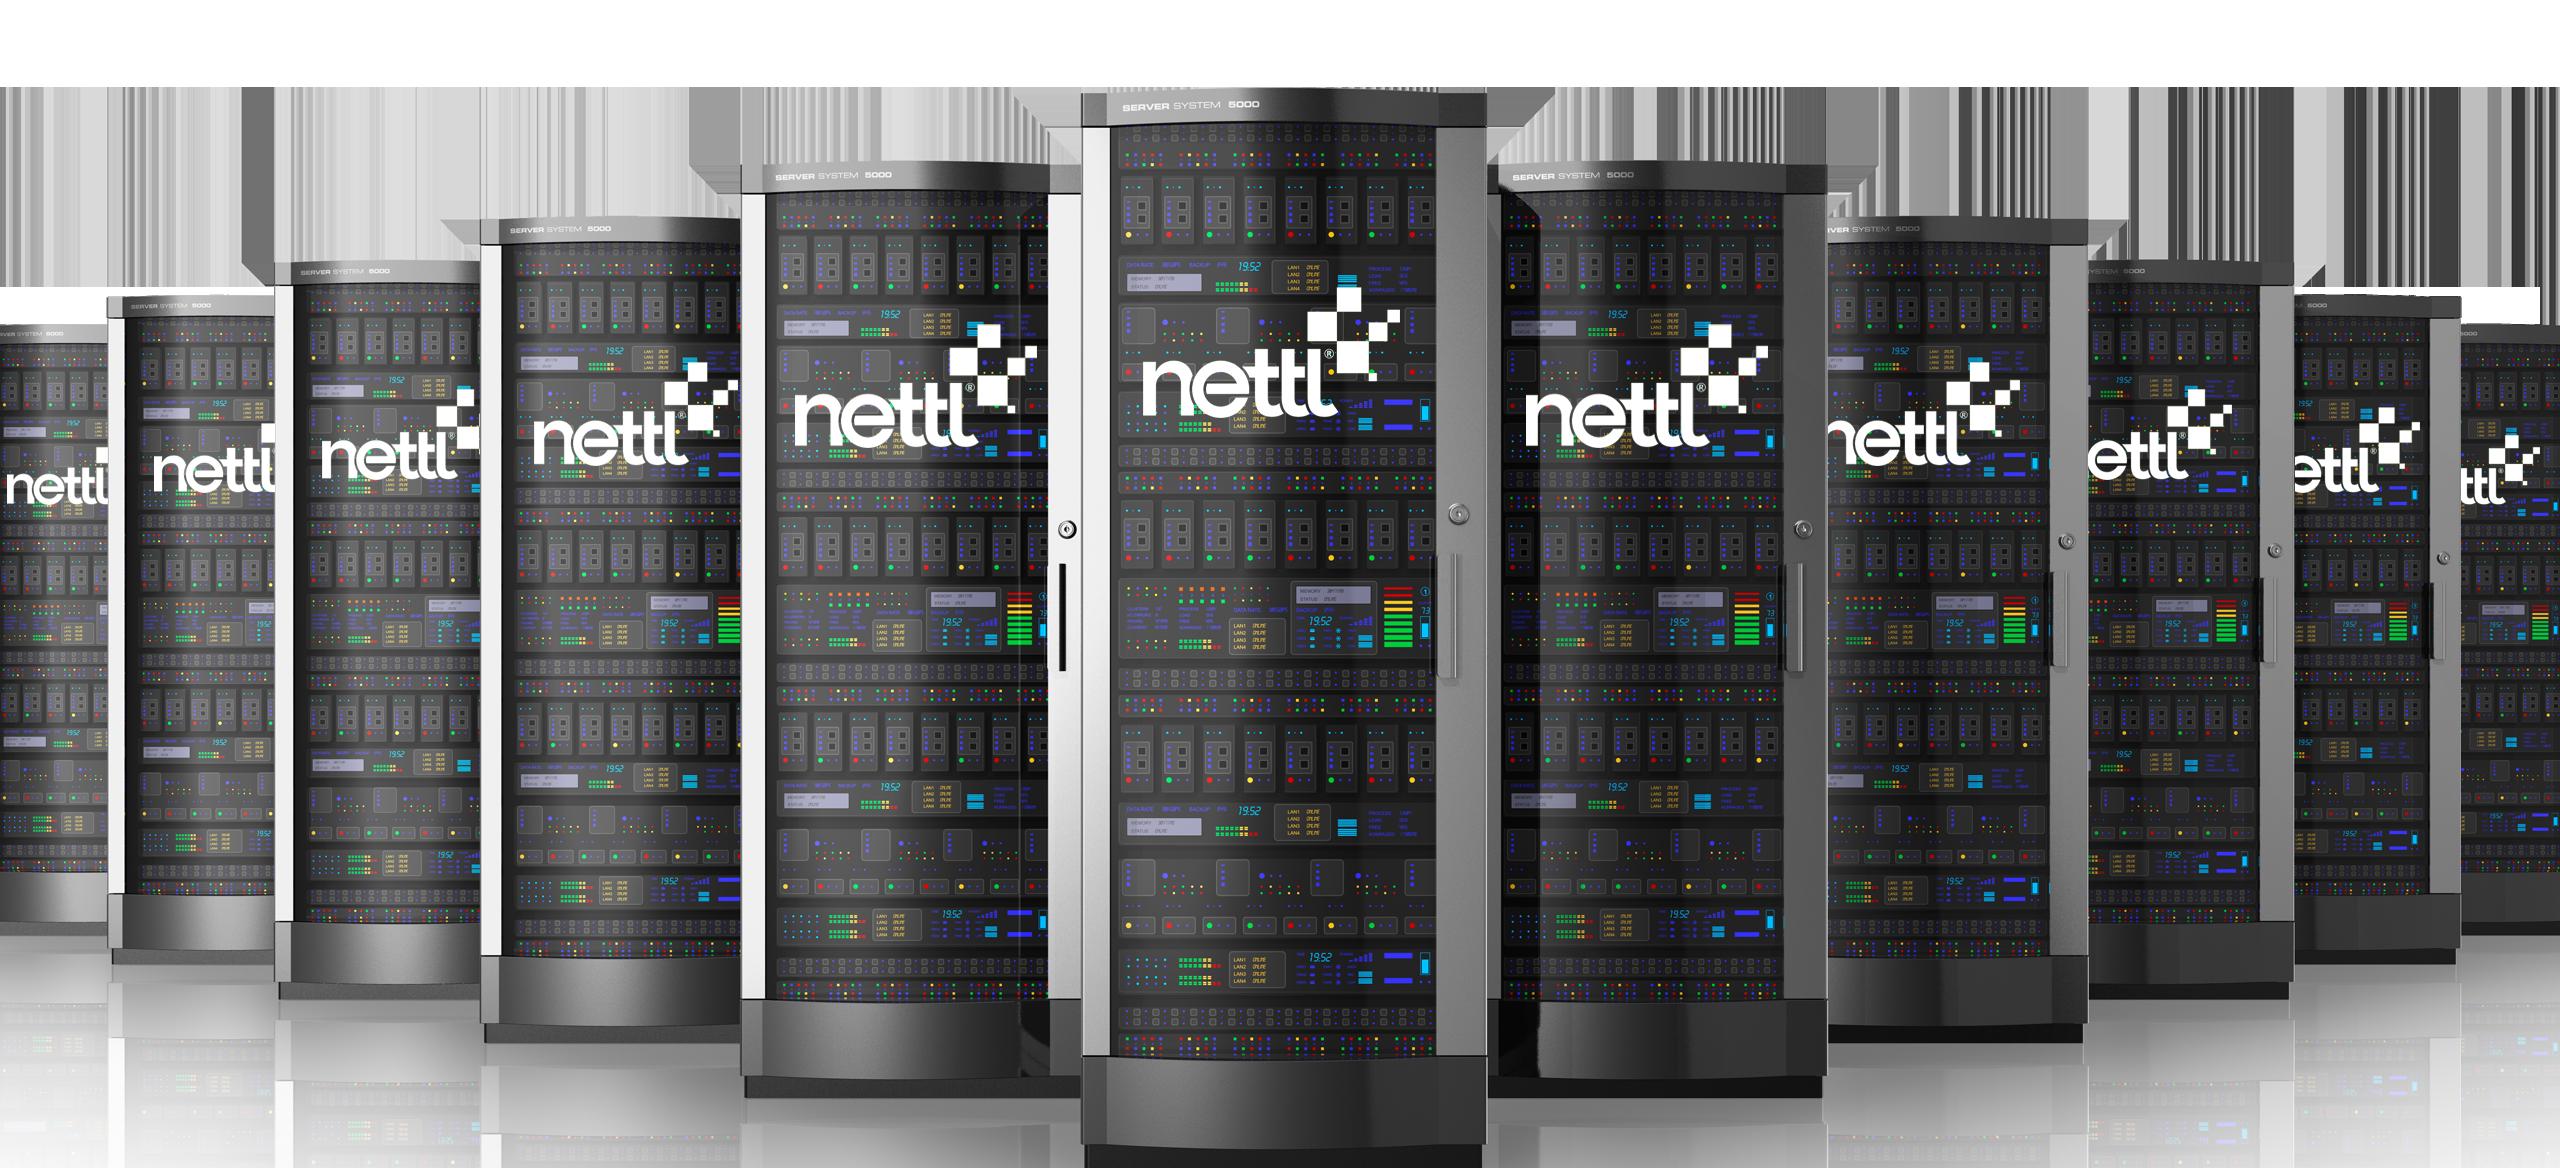 Cloud Servers Nettl Lancaster